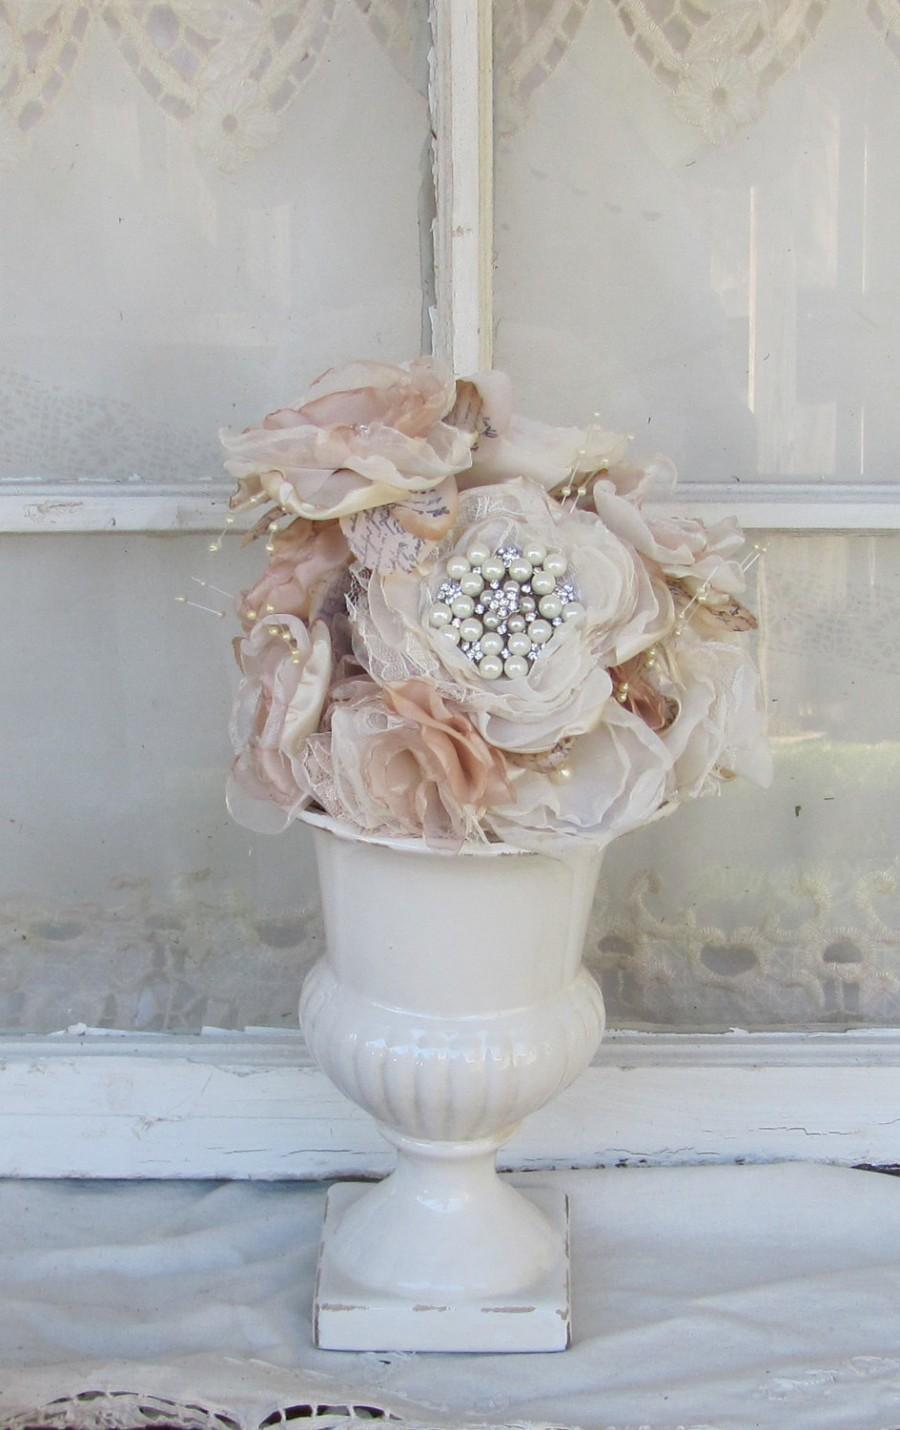 Mariage - Wedding Cake Topper, Champagne wedding, flower cake top, Rhinestones cake decor, cake decor,floral cake topper, wedding cake flowers,